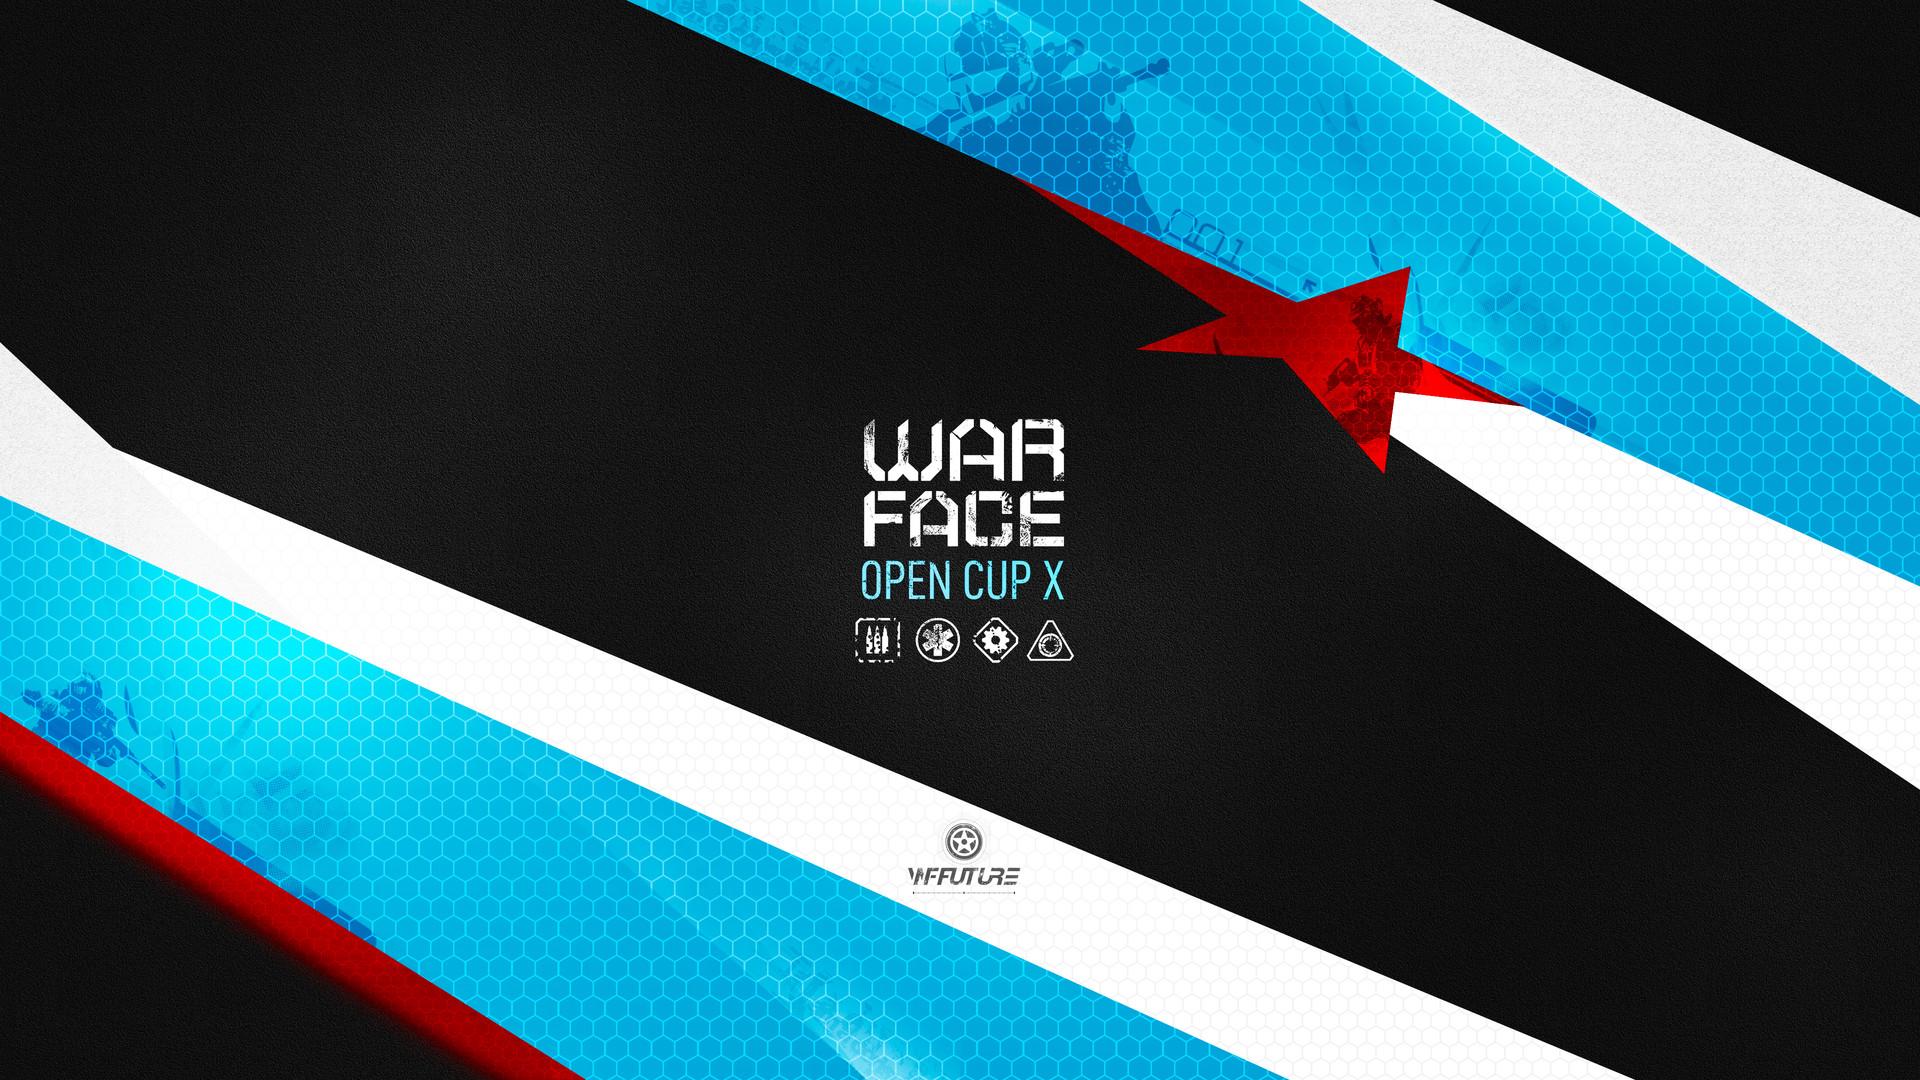 Home Wallpaper Hd Vadim Shatkov Warface Open Cup Season X Wallpaper